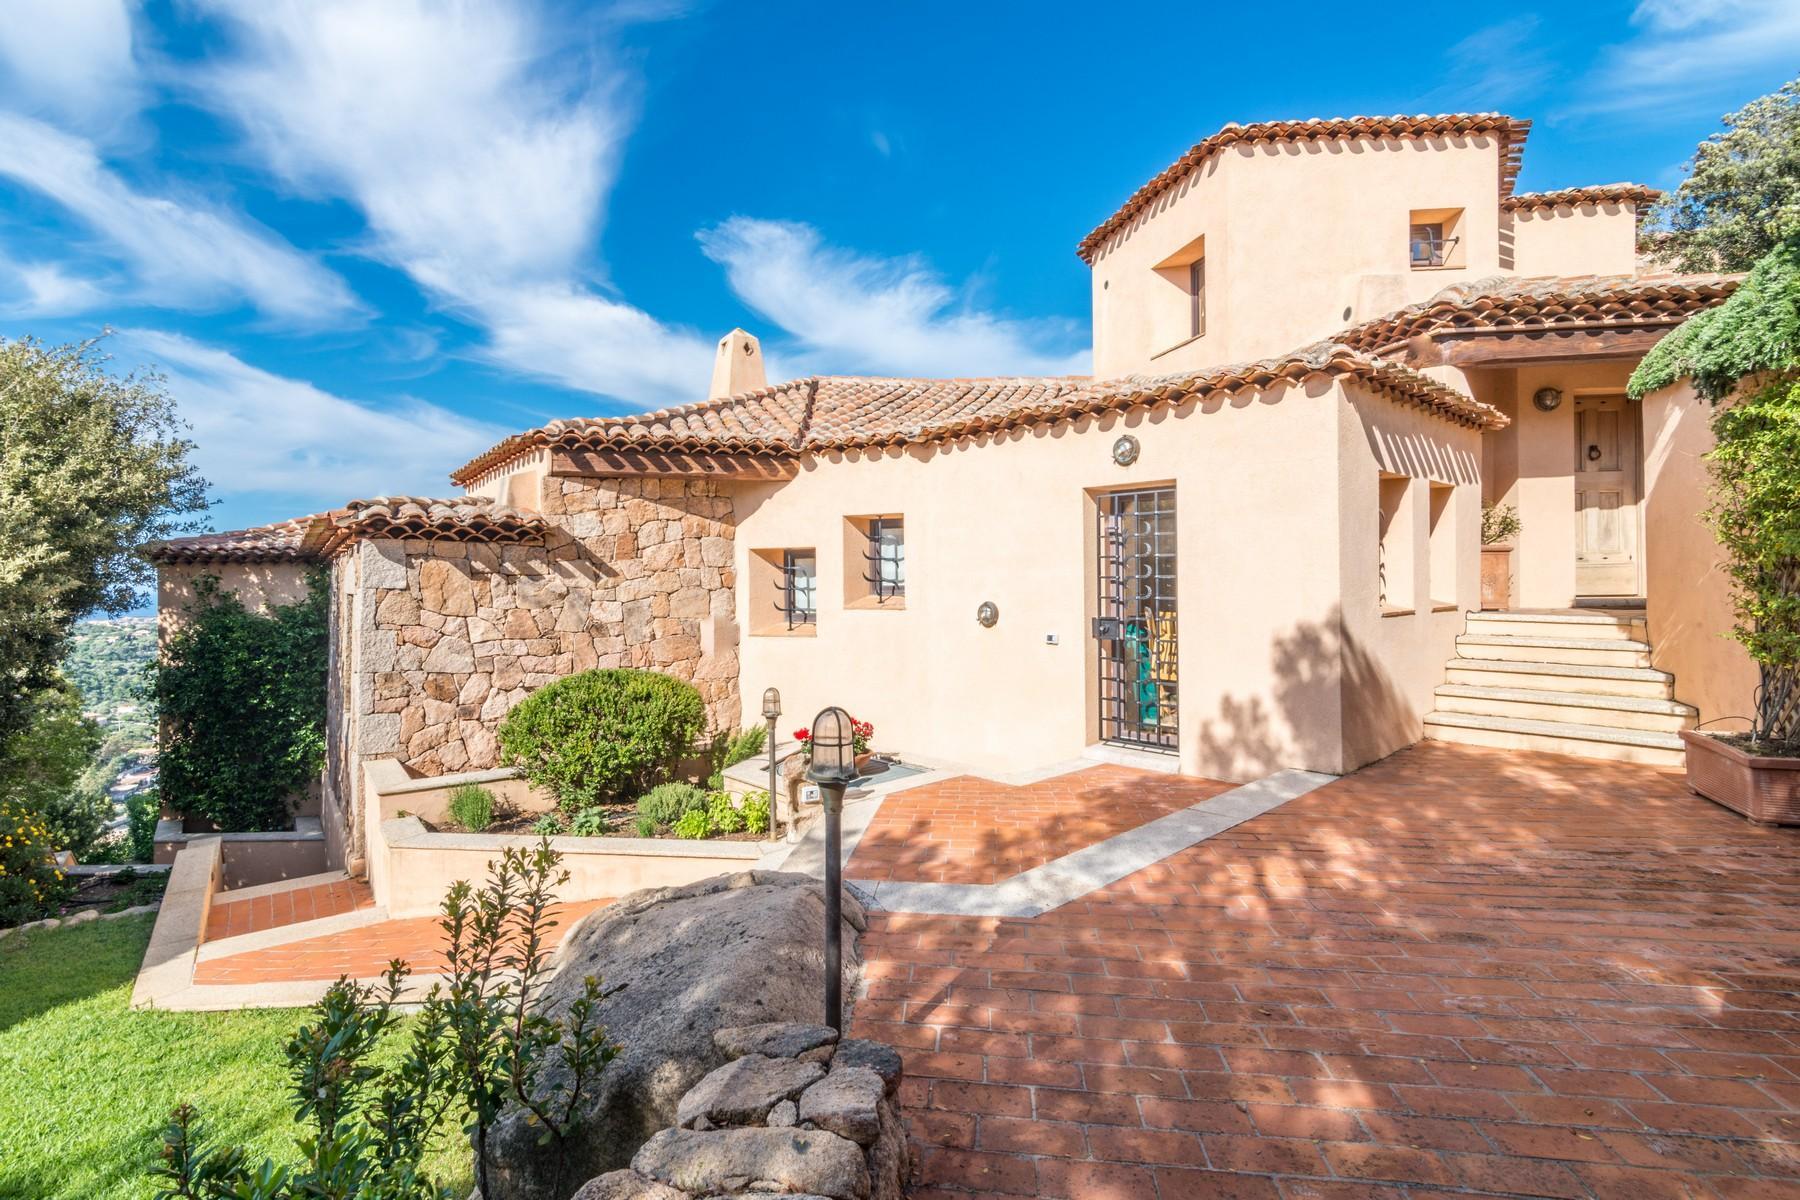 Porto Cervo Abbiadori Splendide villa jumelée avec vue sur le golfe de Pevero - 33